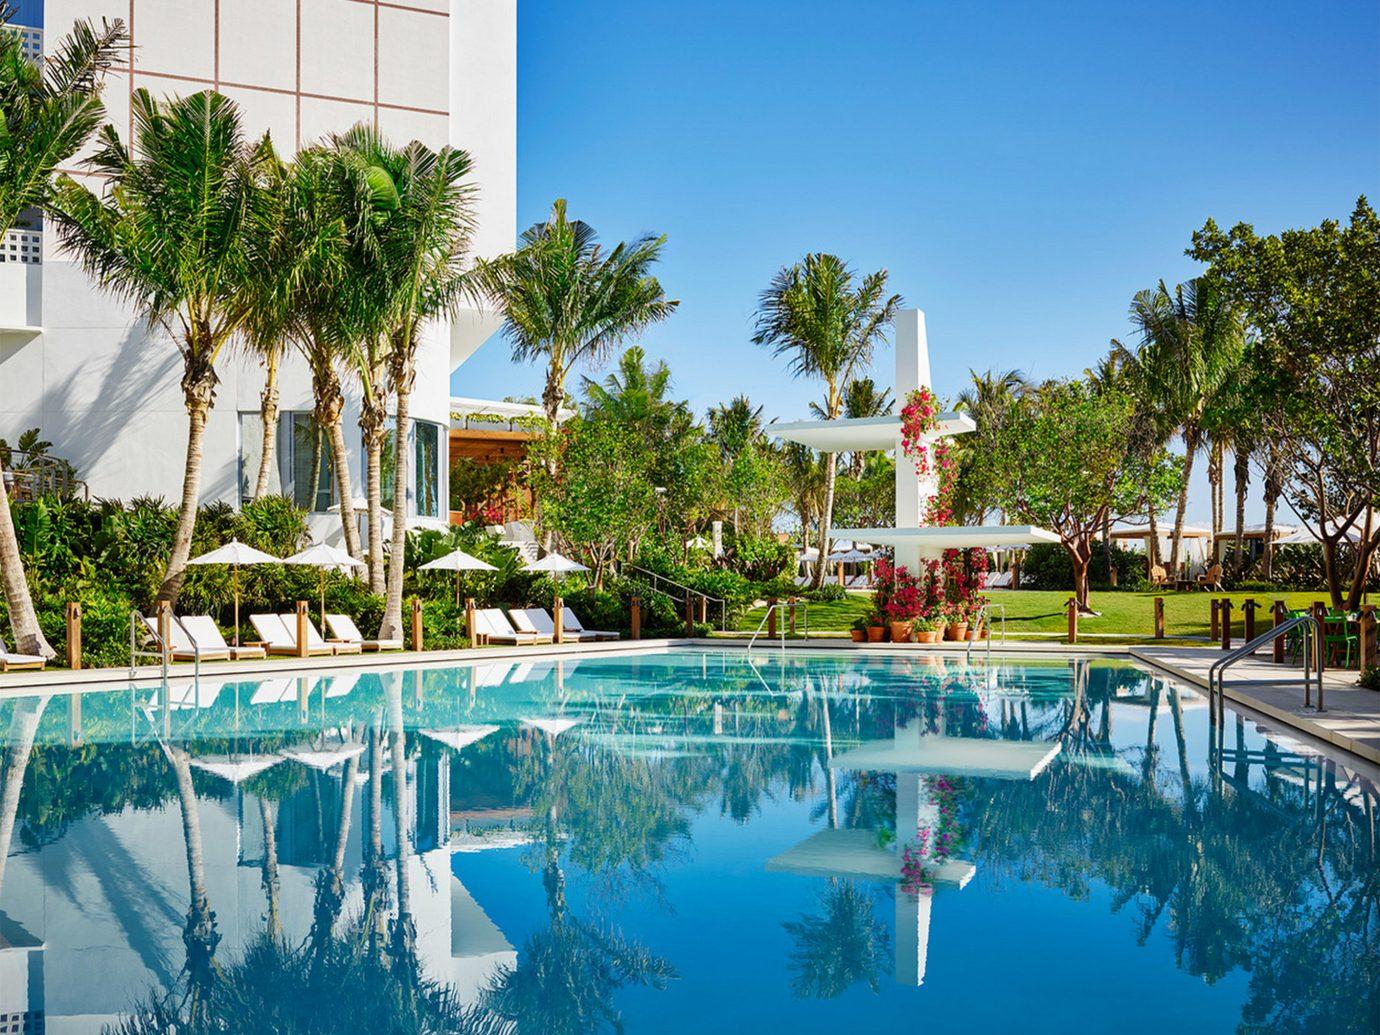 City Exterior Hotels Luxury Miami Miami Beach Modern Pool Trip Ideas tree outdoor swimming pool leisure property Resort estate vacation condominium reflecting pool resort town home real estate Villa backyard area Garden